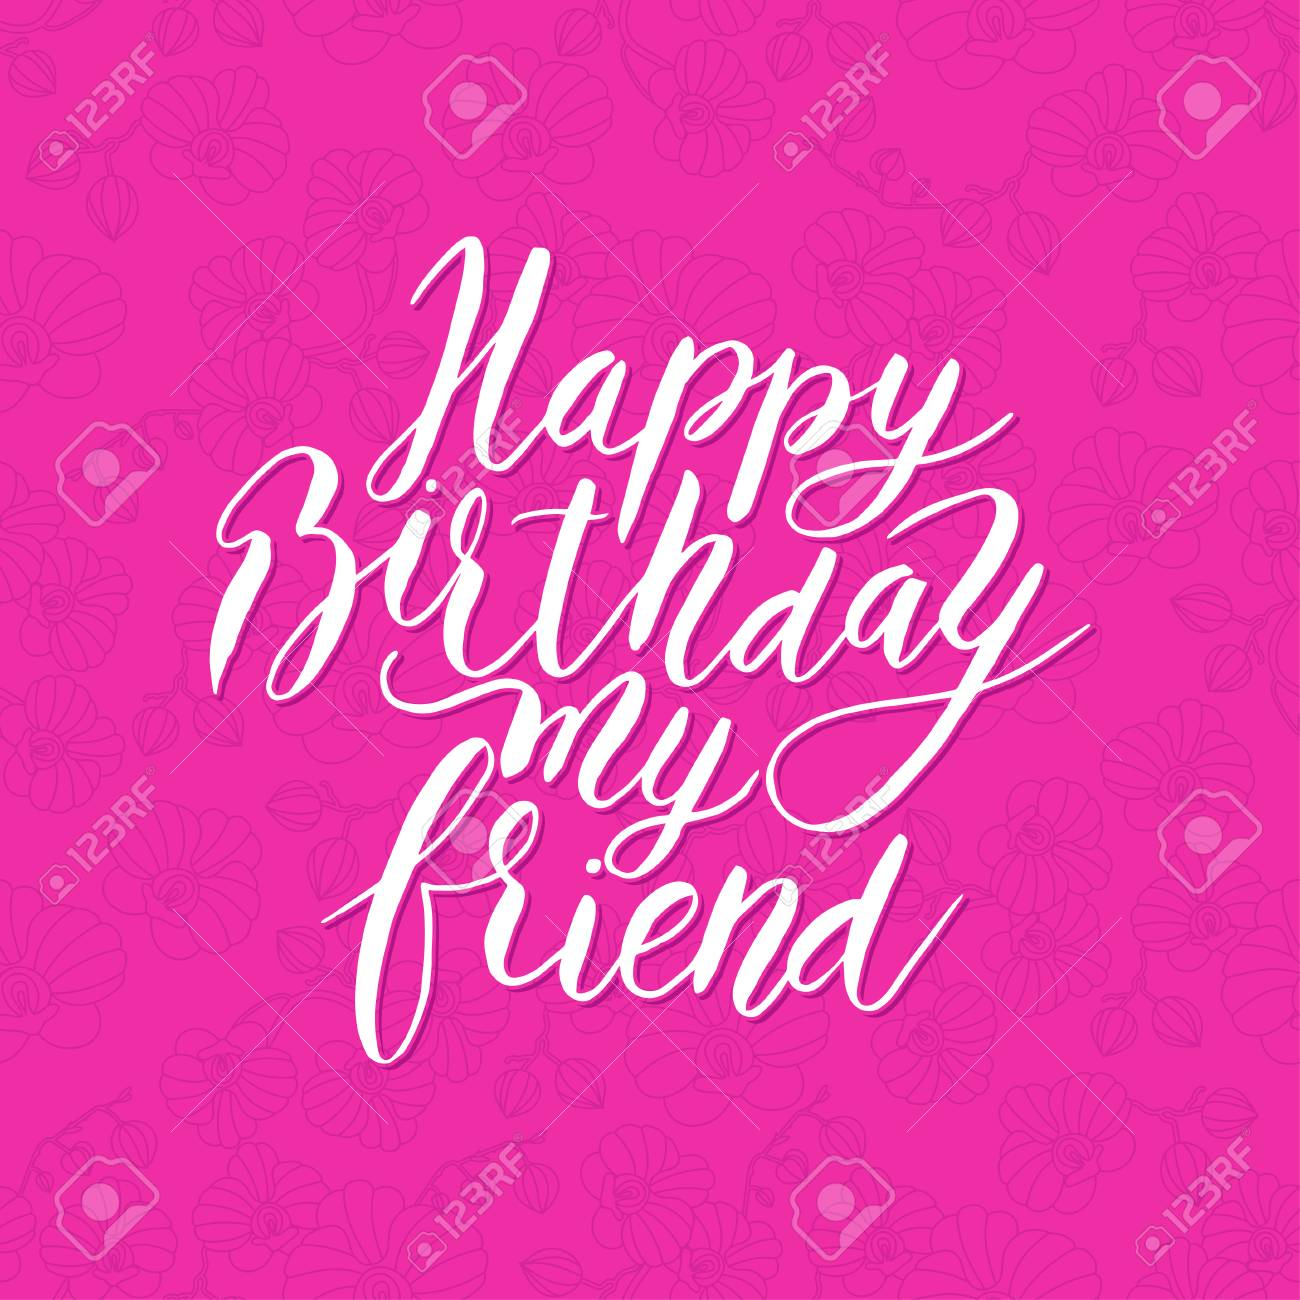 Boyfriend Happy Birthday Friend Congratulating Hand Drawn Quote Stock Vector 81955402 Happy Birthday Friend Congratulating Hand Drawn Quote Royalty Free